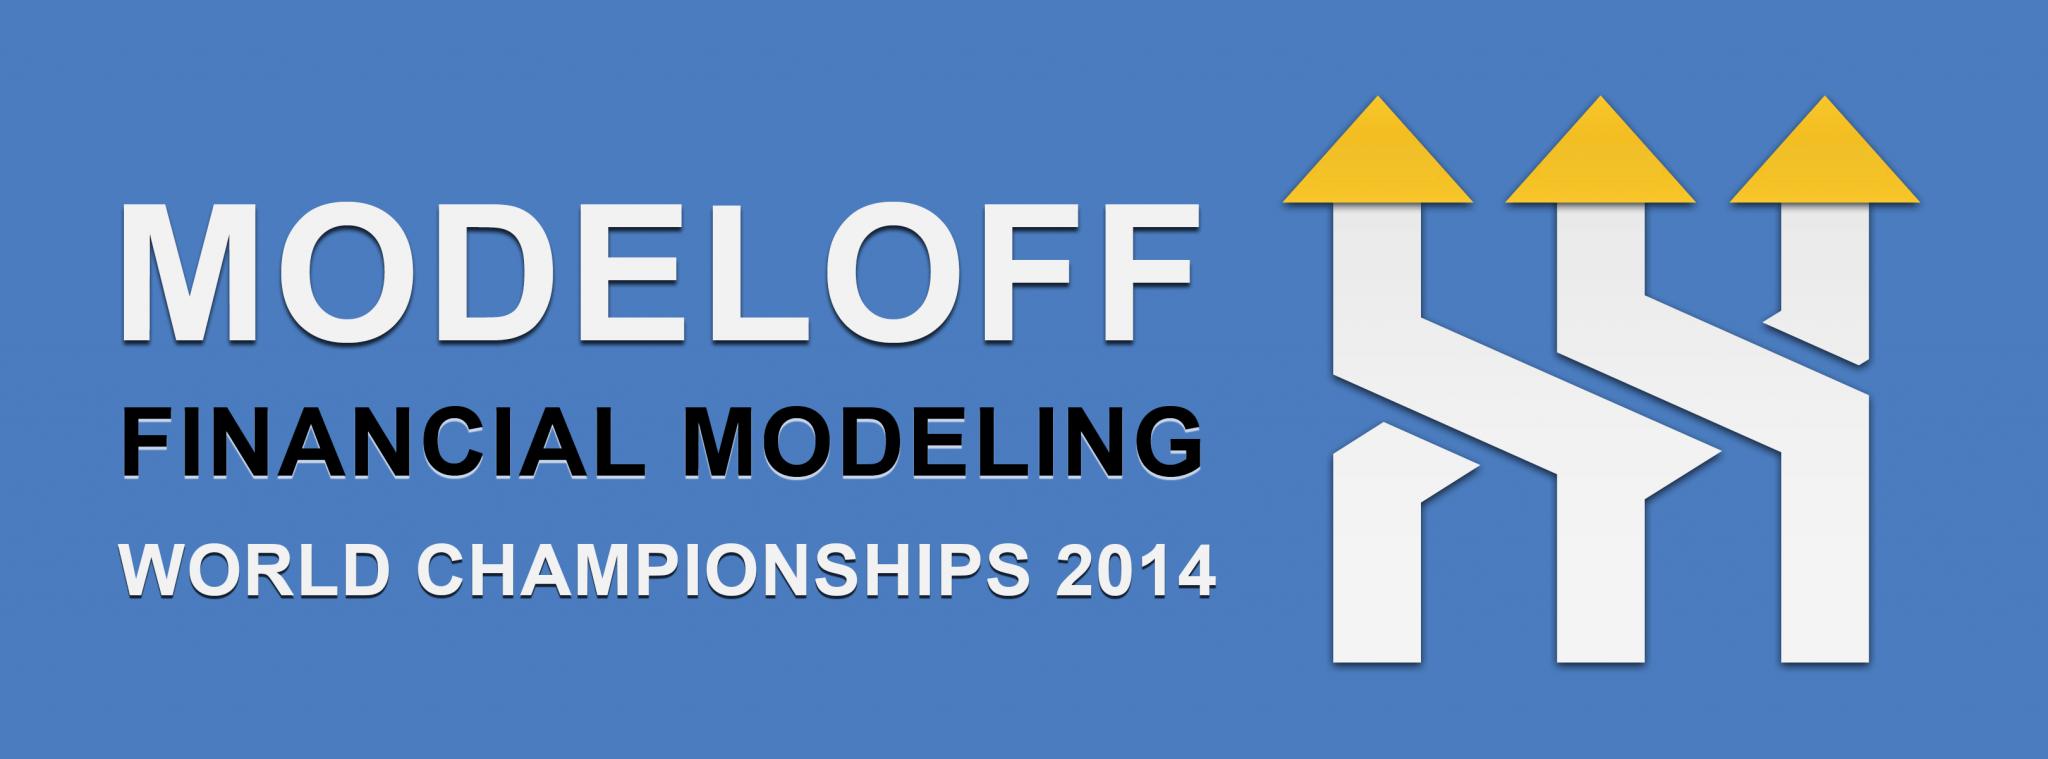 ModelOff 2014